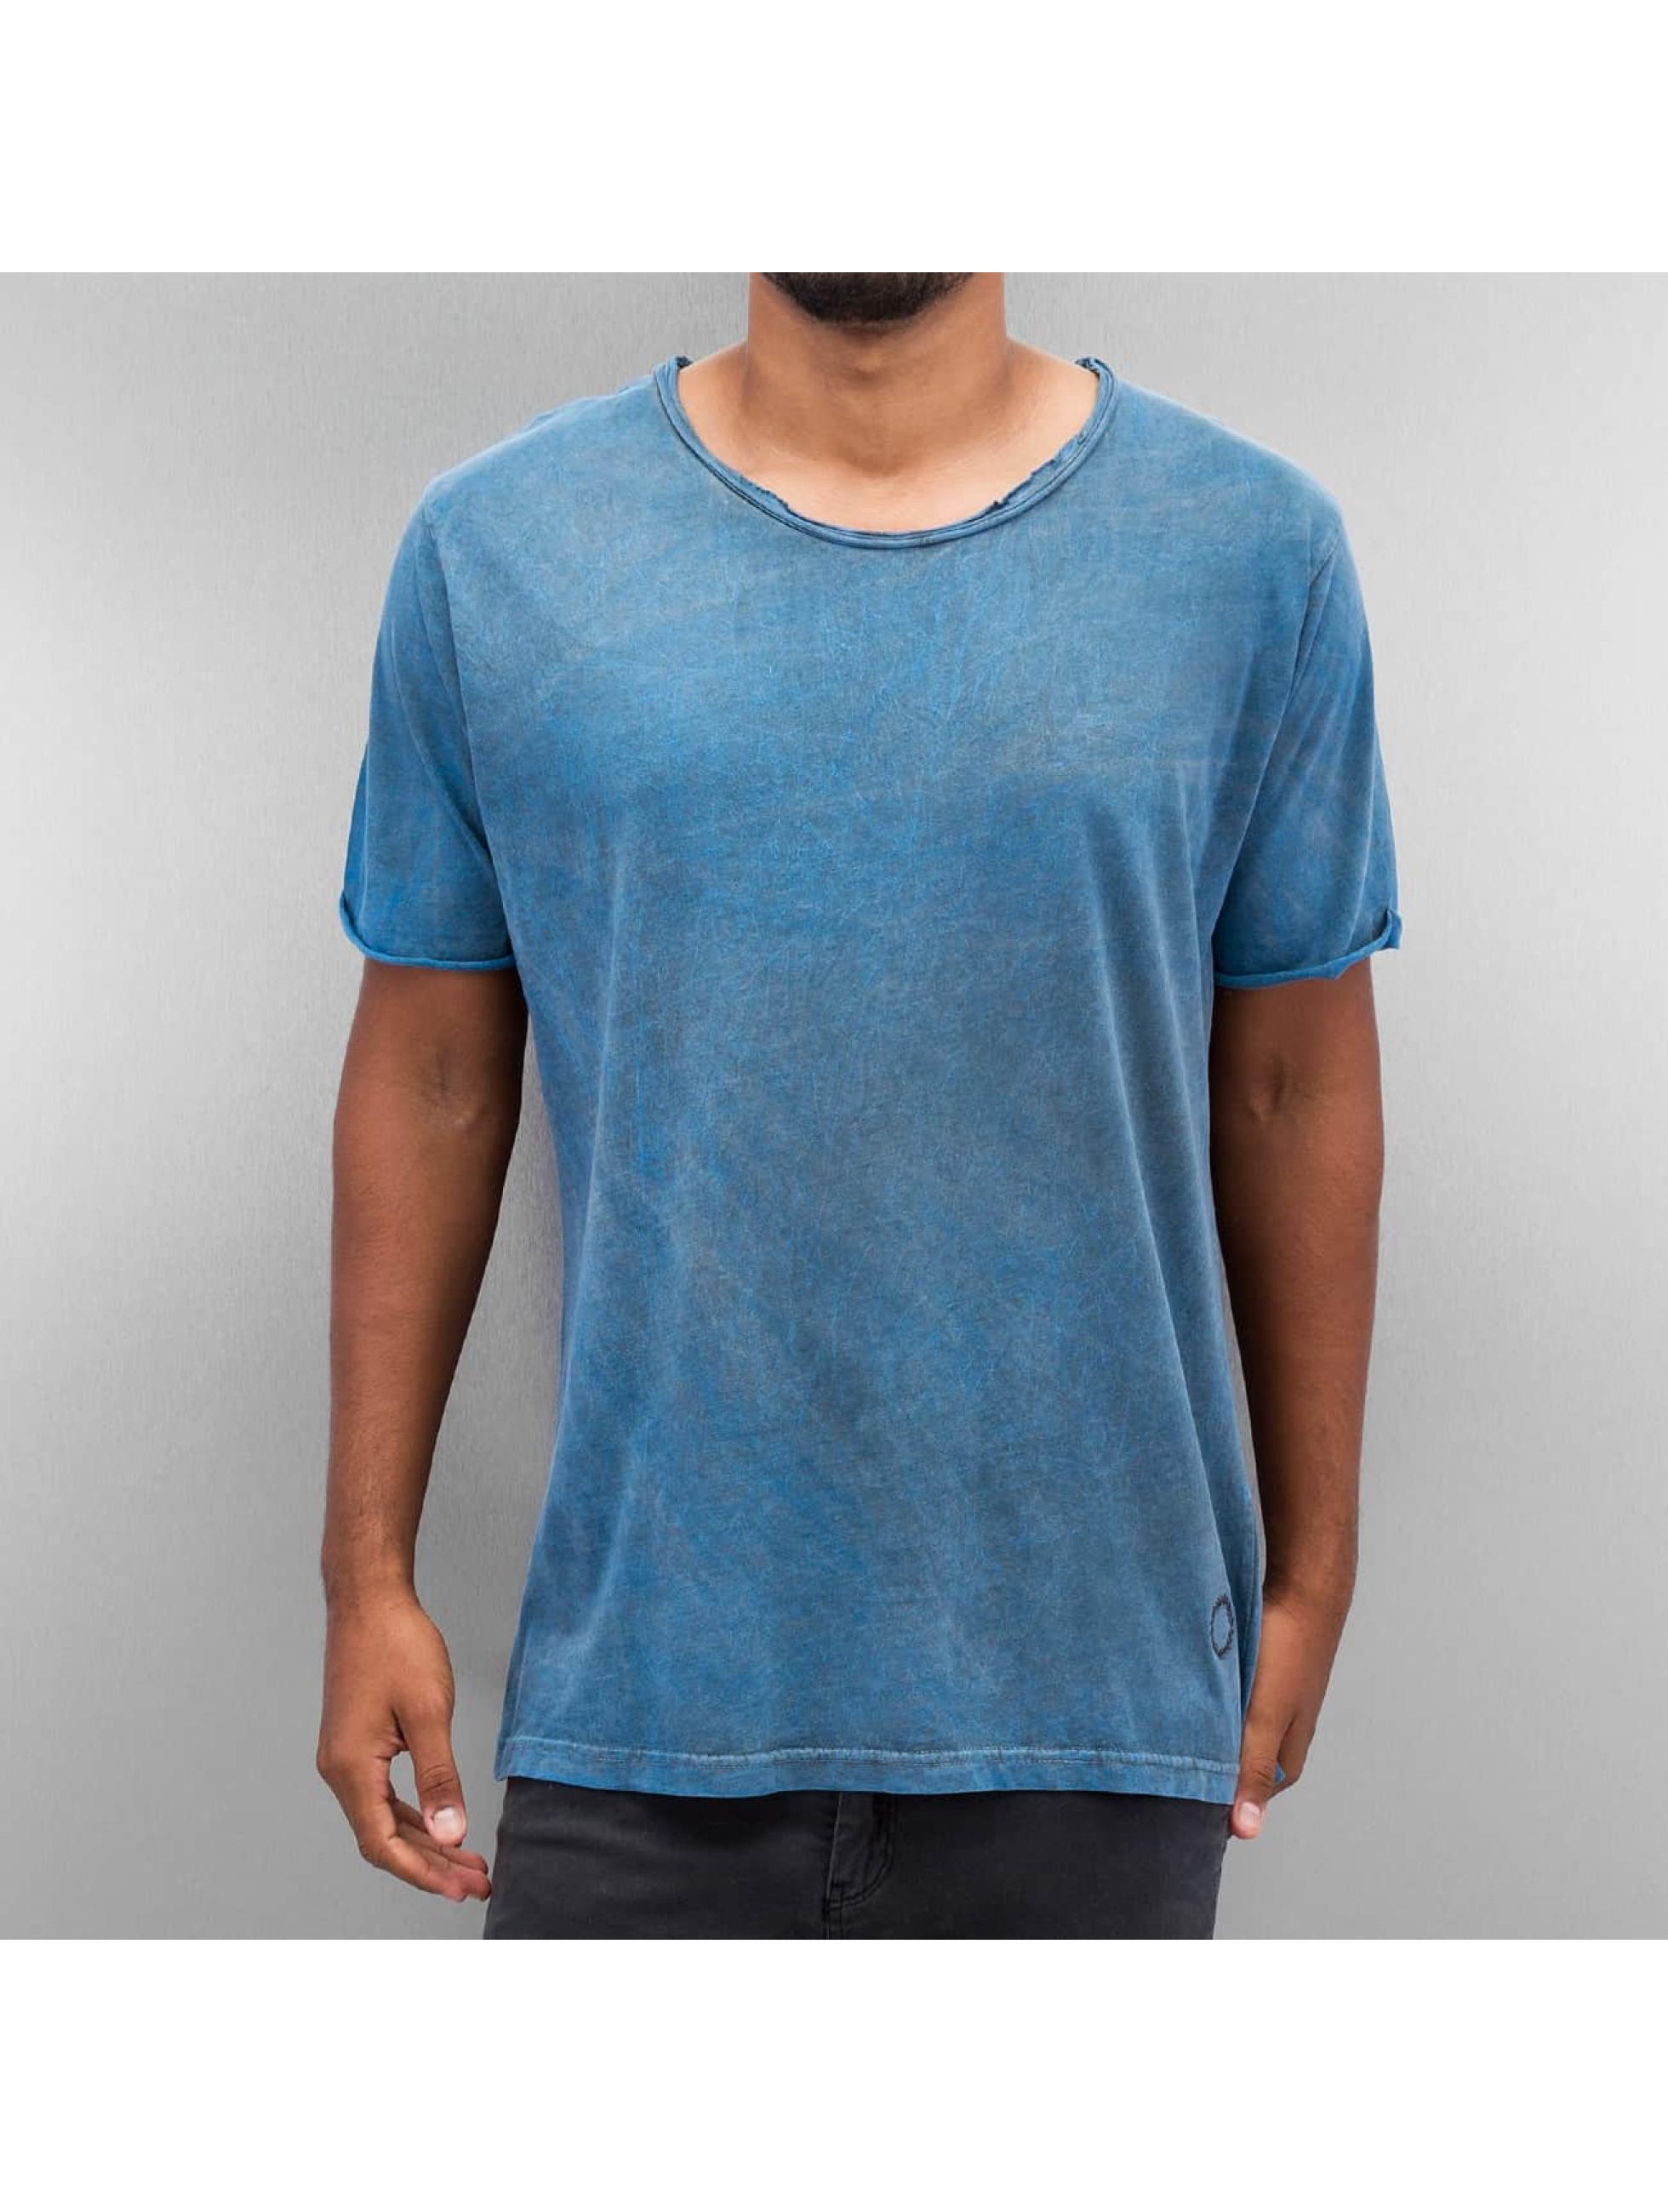 Yezz T-Shirt Marble blue